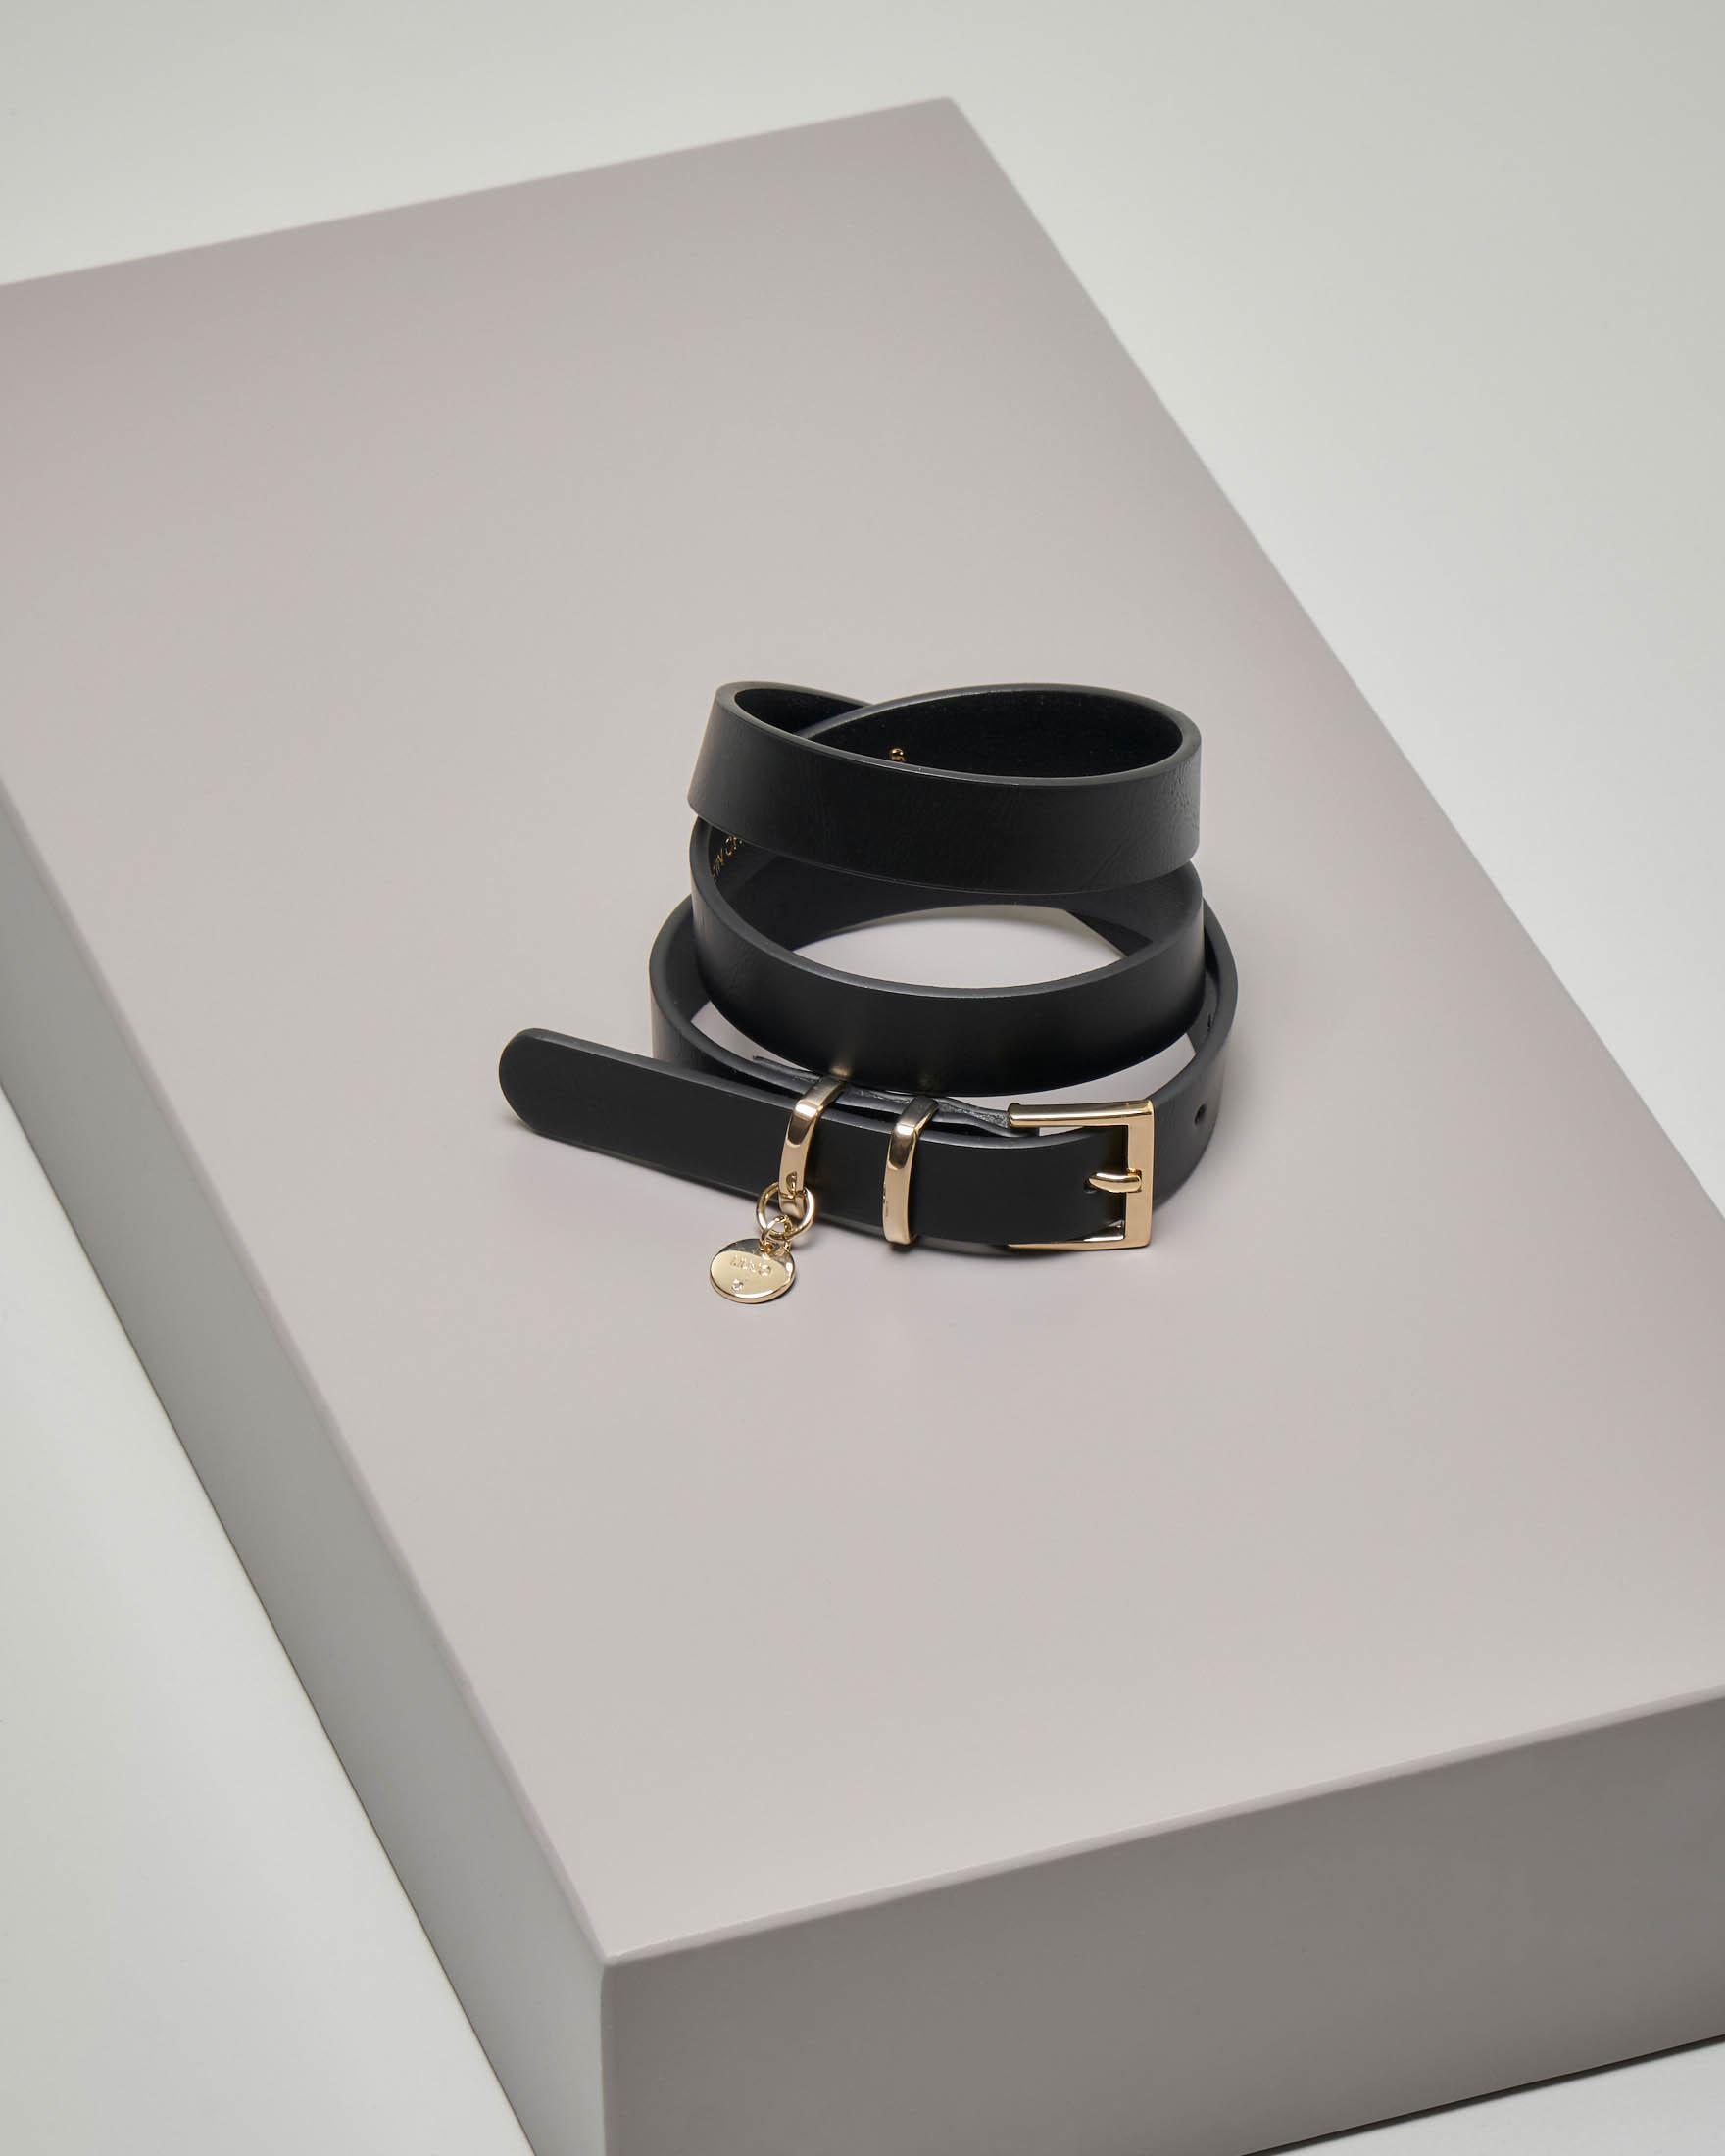 Cintura nera sottile in similpelle con charm